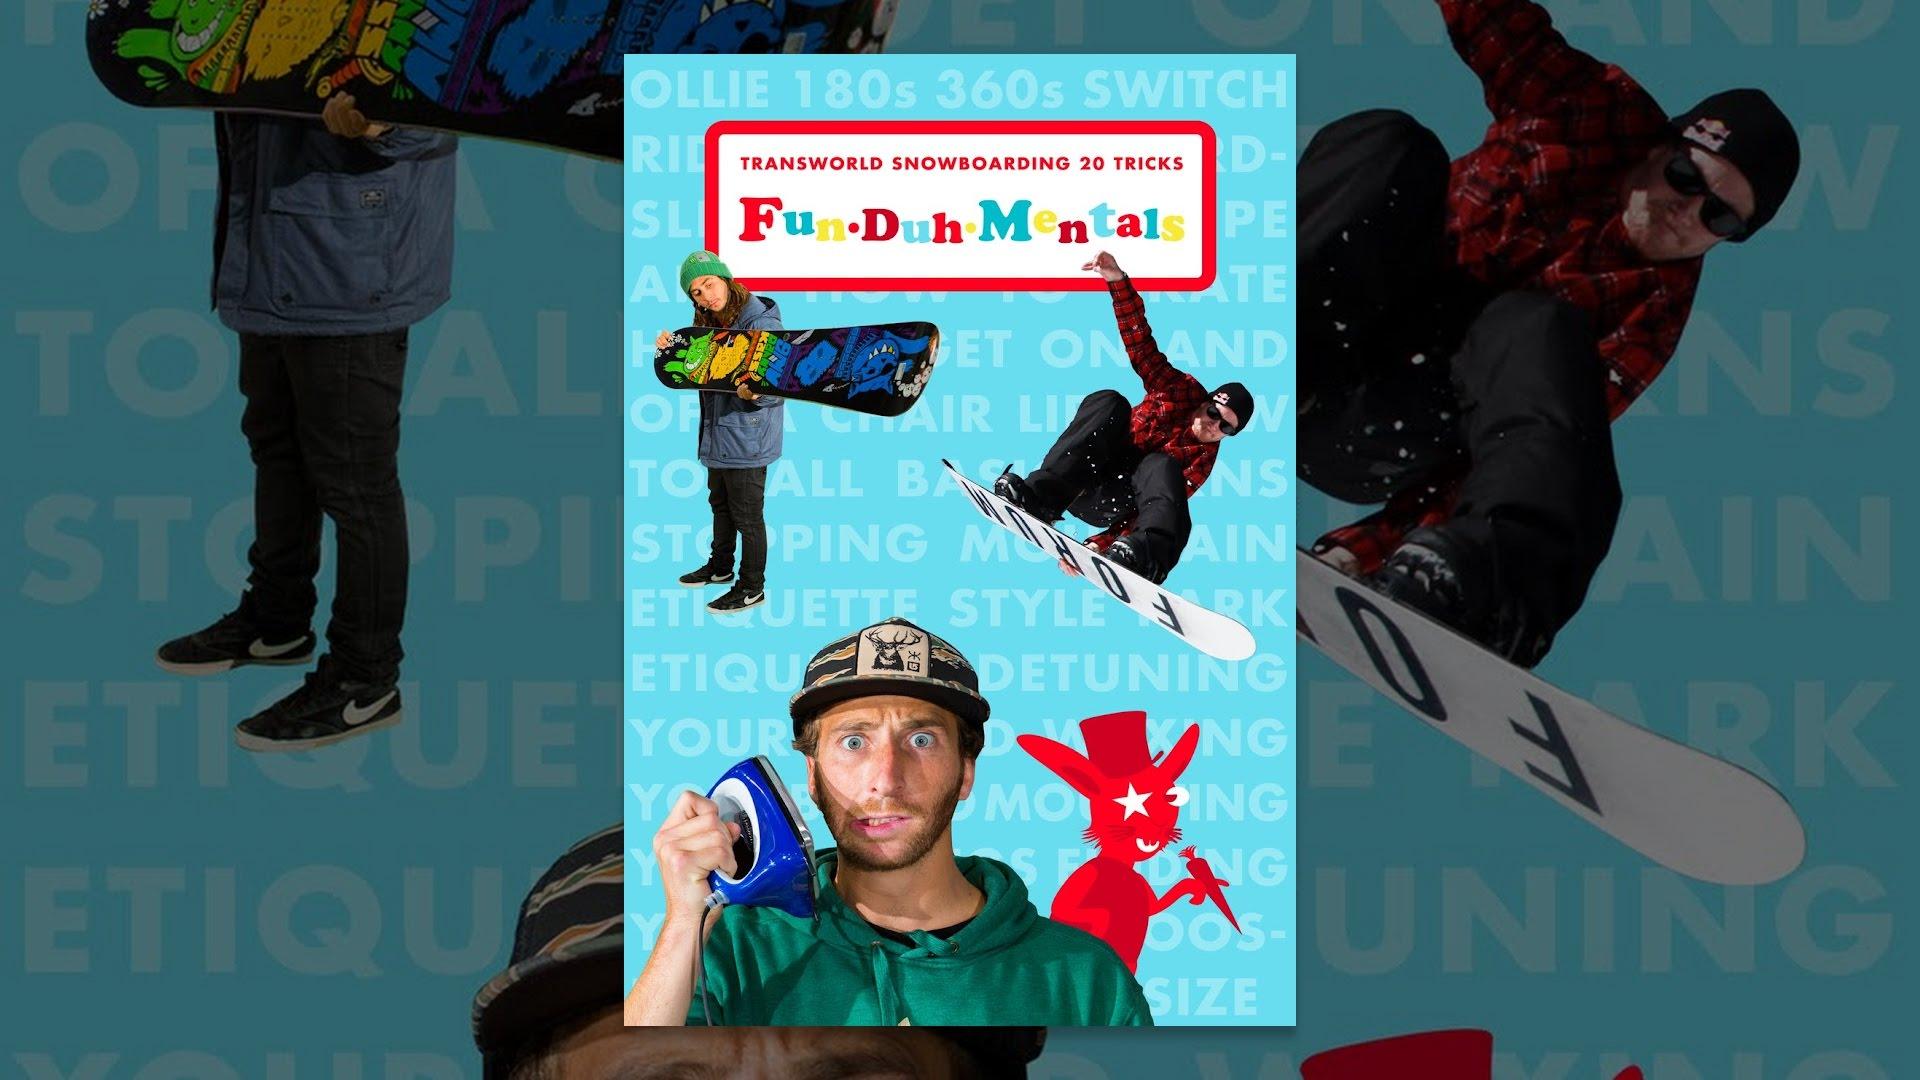 17950b9f9063 FunDuhMentals  Transworld Snowboarding 20 Tricks - YouTube